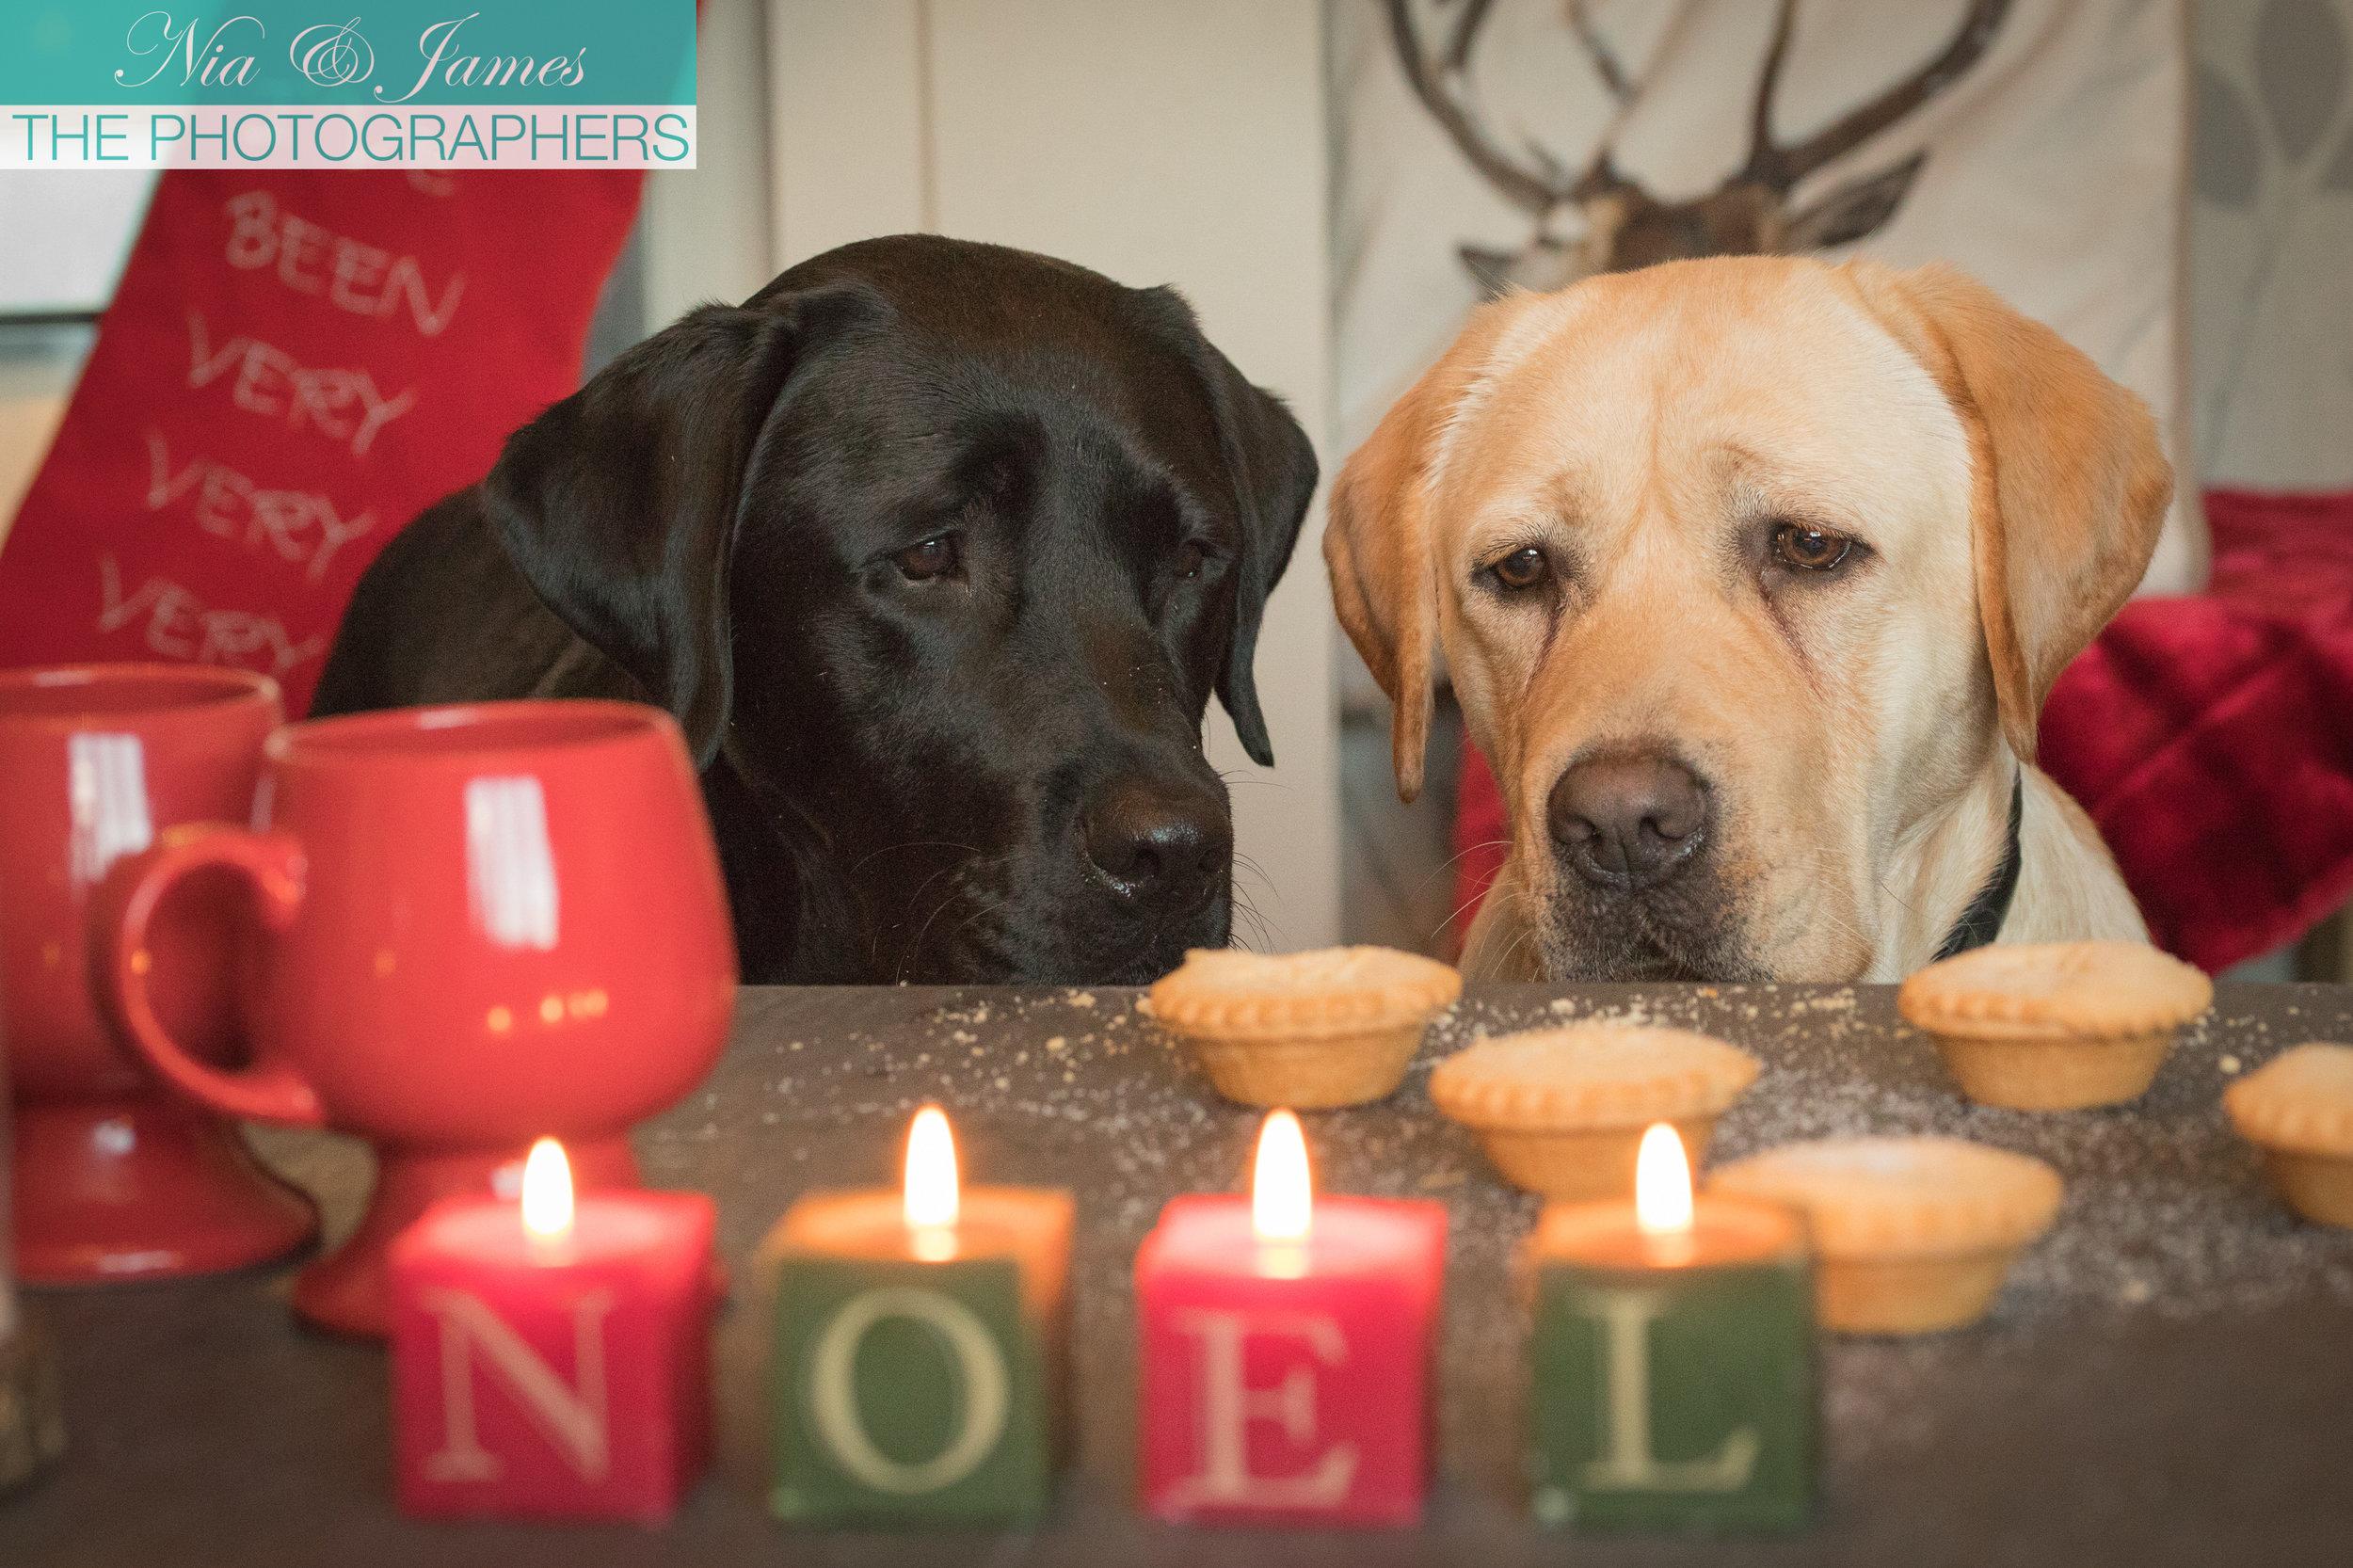 Nia & James The Photographers 2016 Christmas Card Design